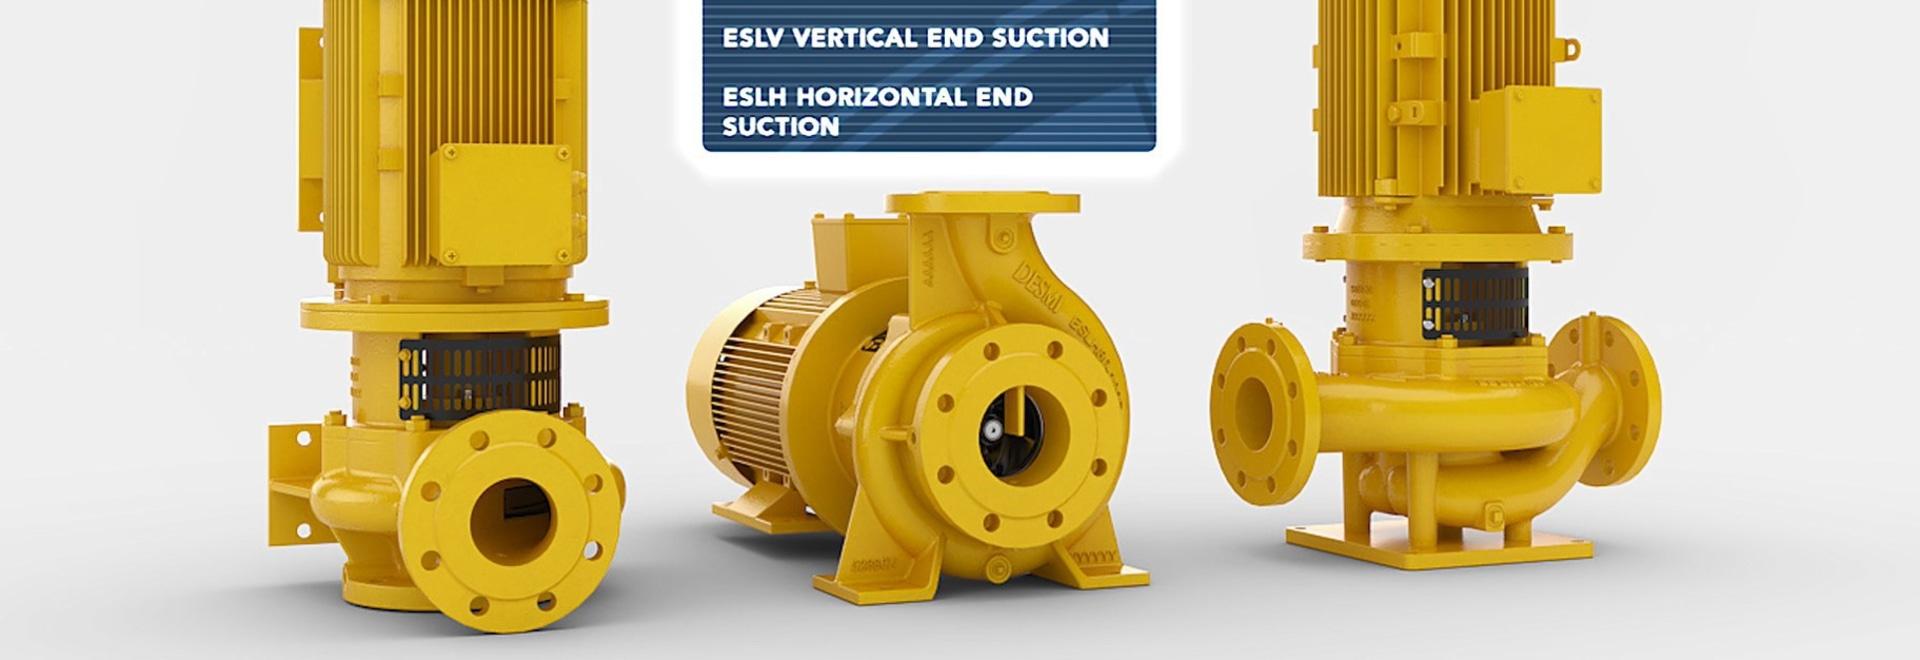 New DESMI ESL Centrifugal Pump Video